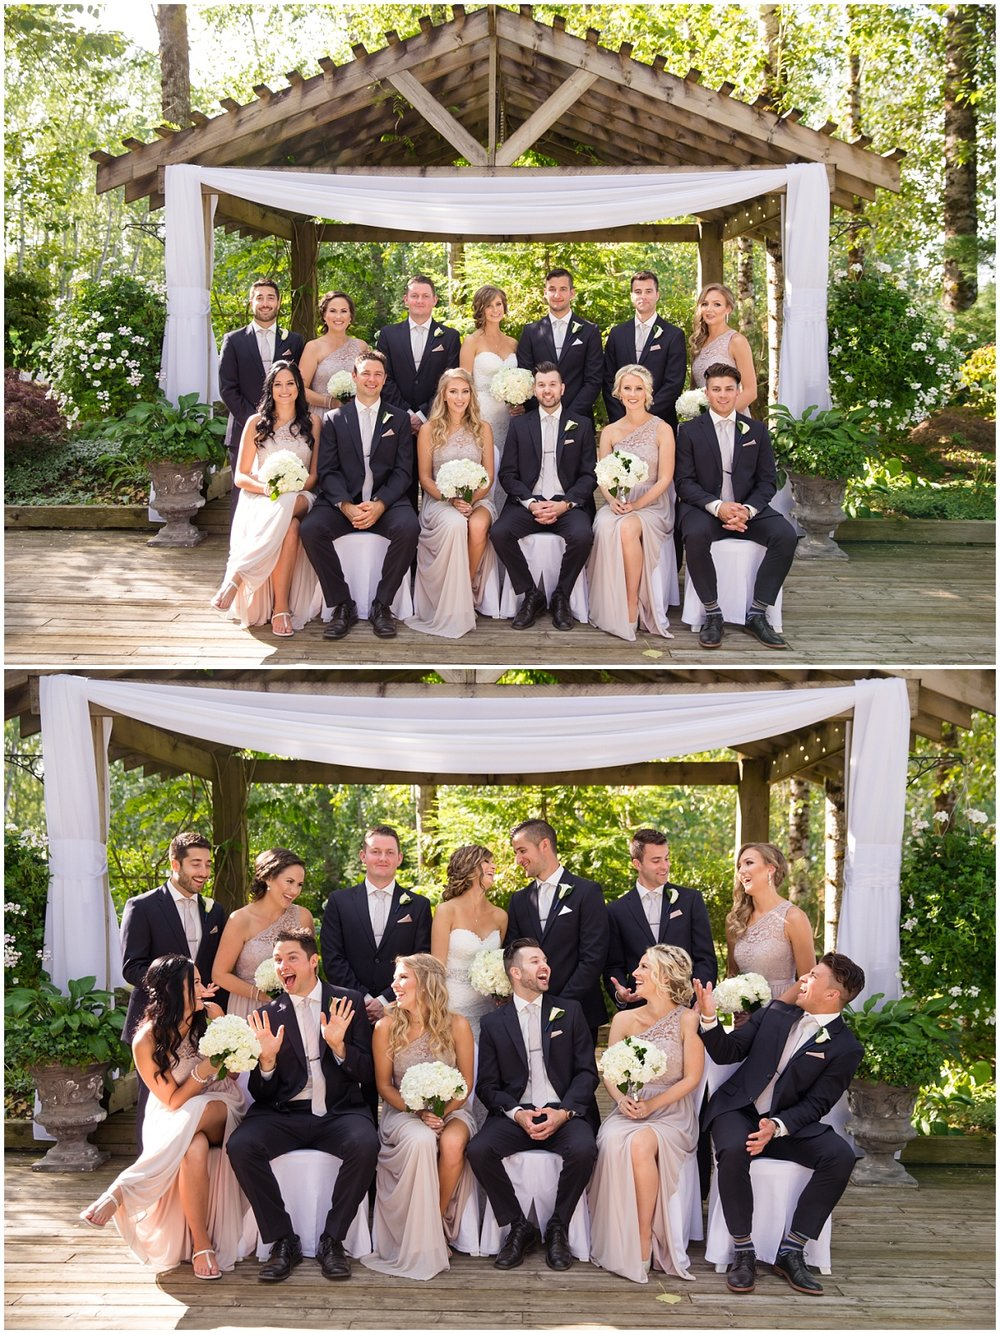 Amazing Day Photography - Redwoods Golf Course Wedding - Amanda and Dustin - Langley Wedding Photographer  (17).jpg